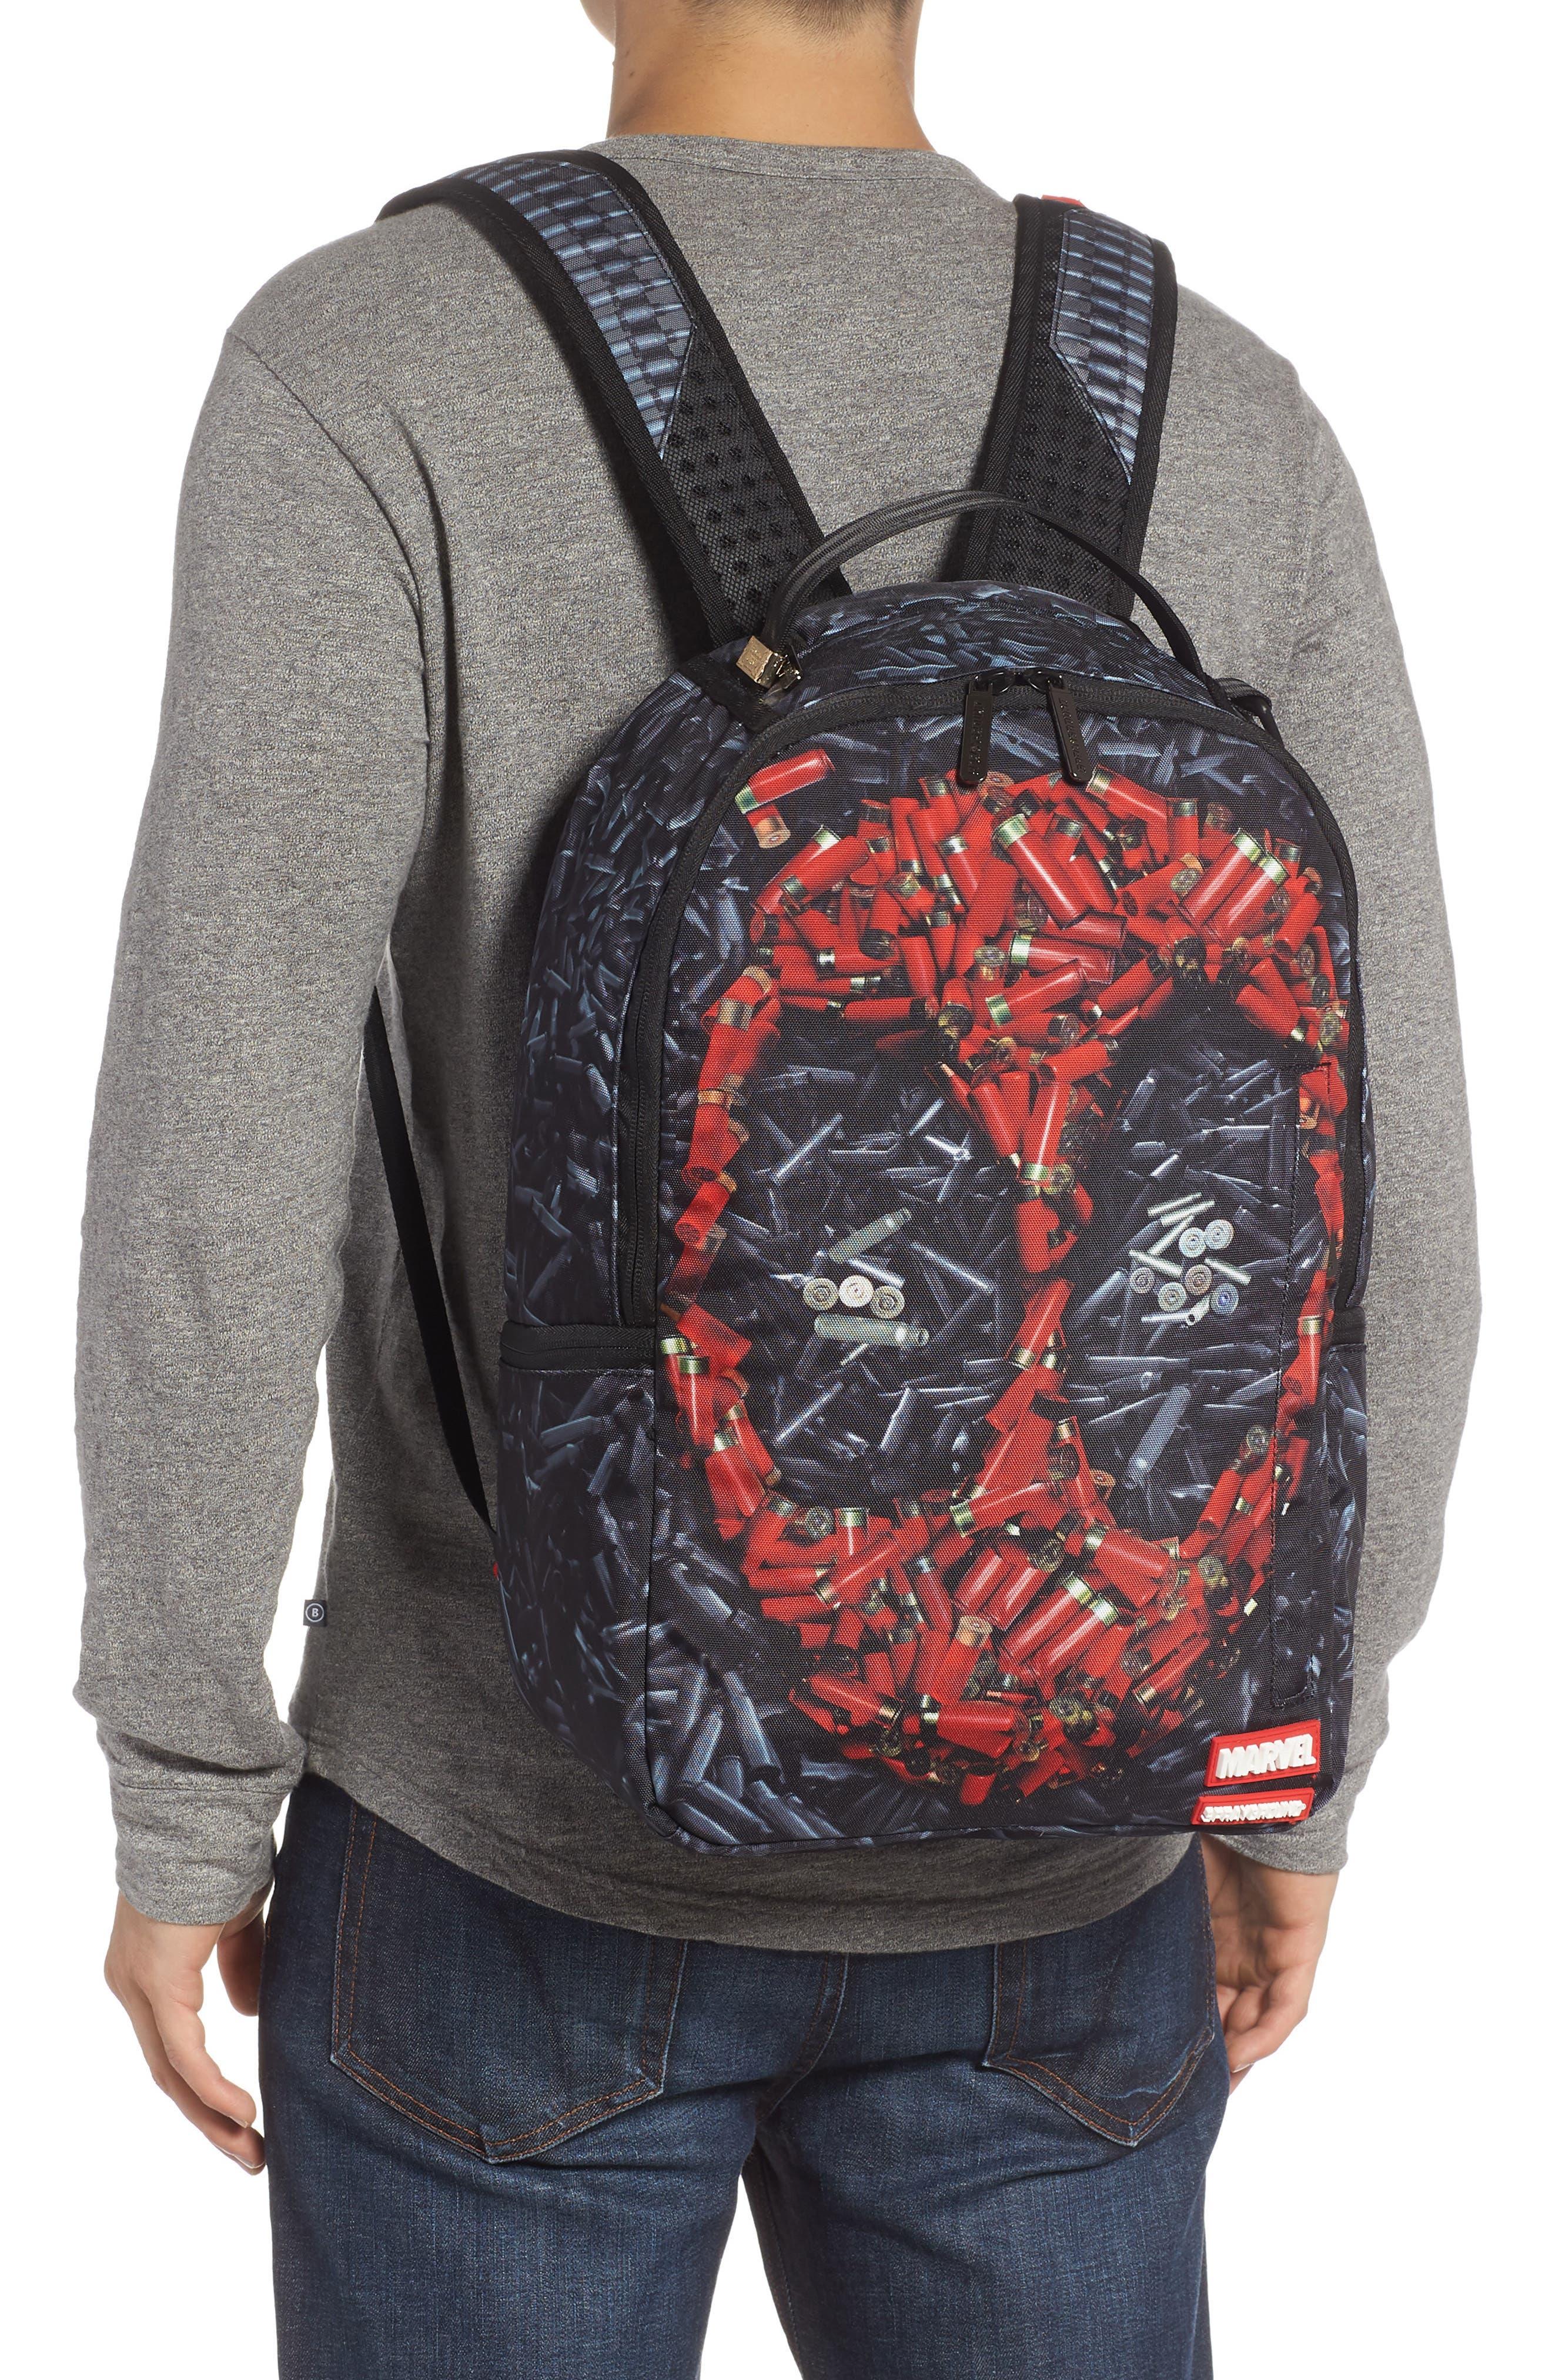 Deadpool Bullets Backpack,                             Alternate thumbnail 2, color,                             001